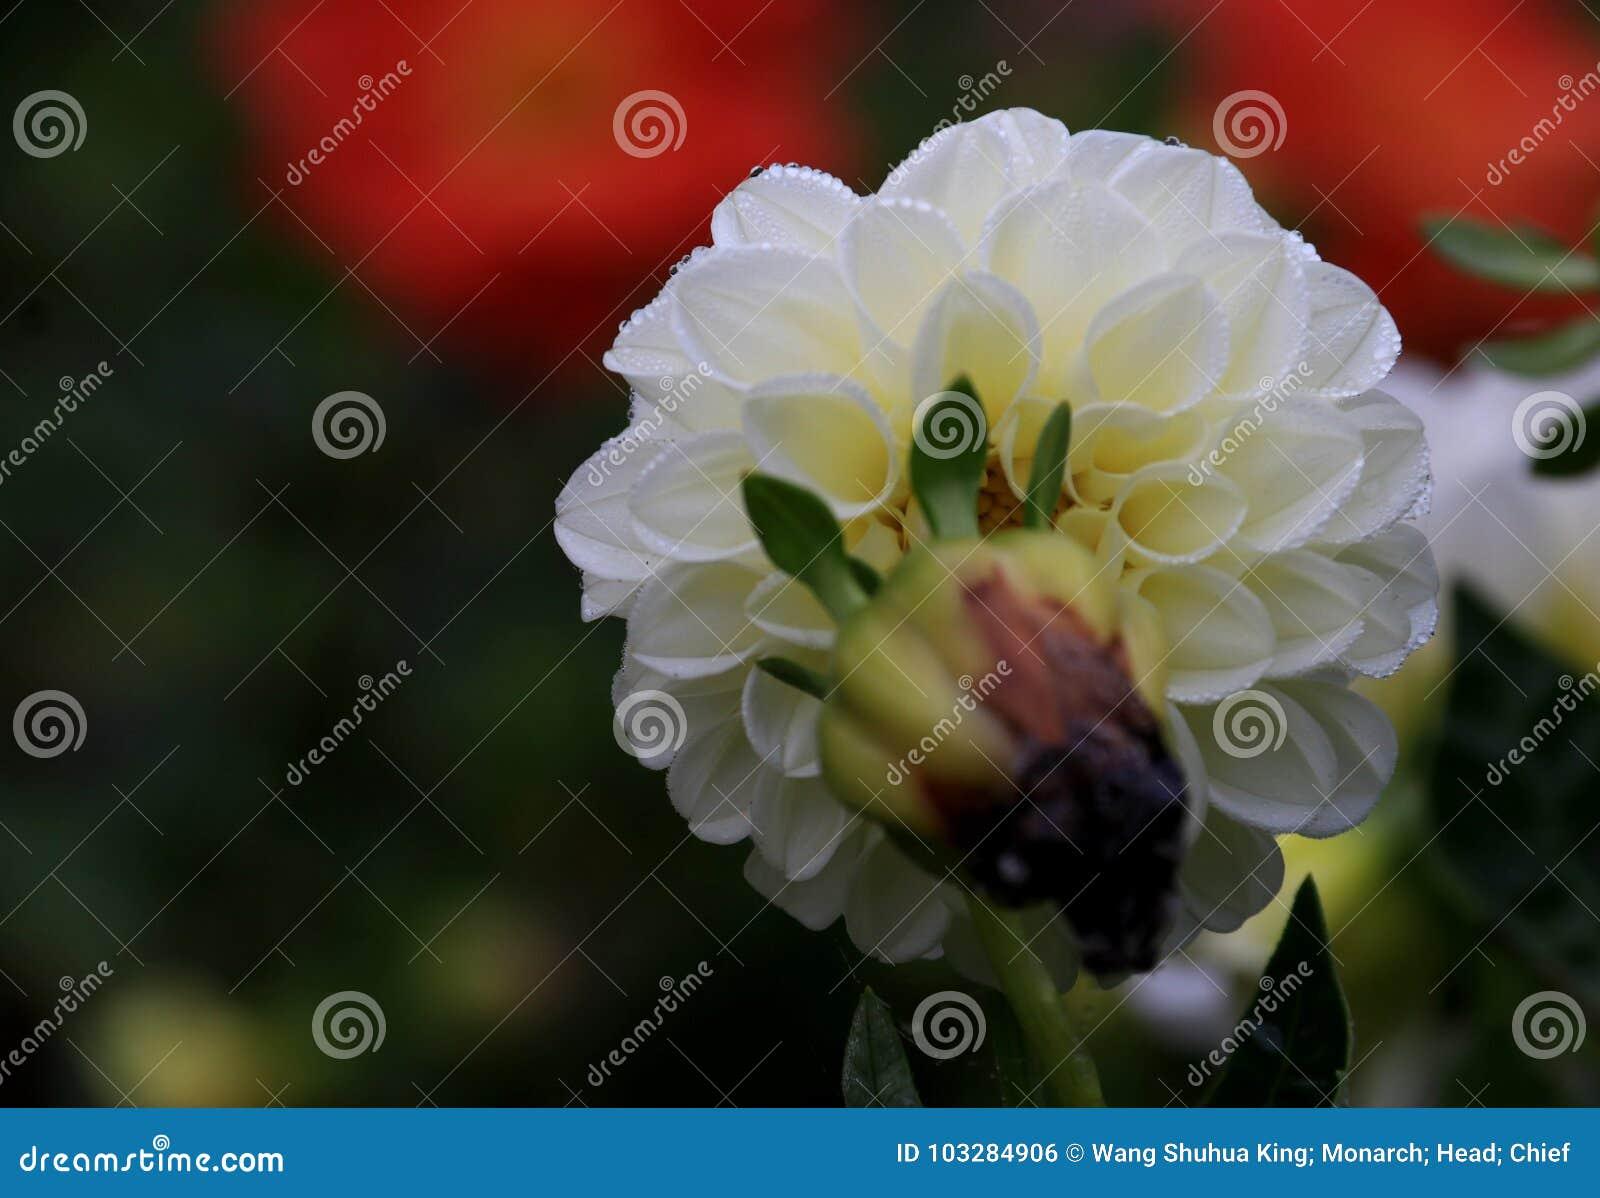 Flower Stock Photo Image Of Familynn Aquatic Daughter 103284906